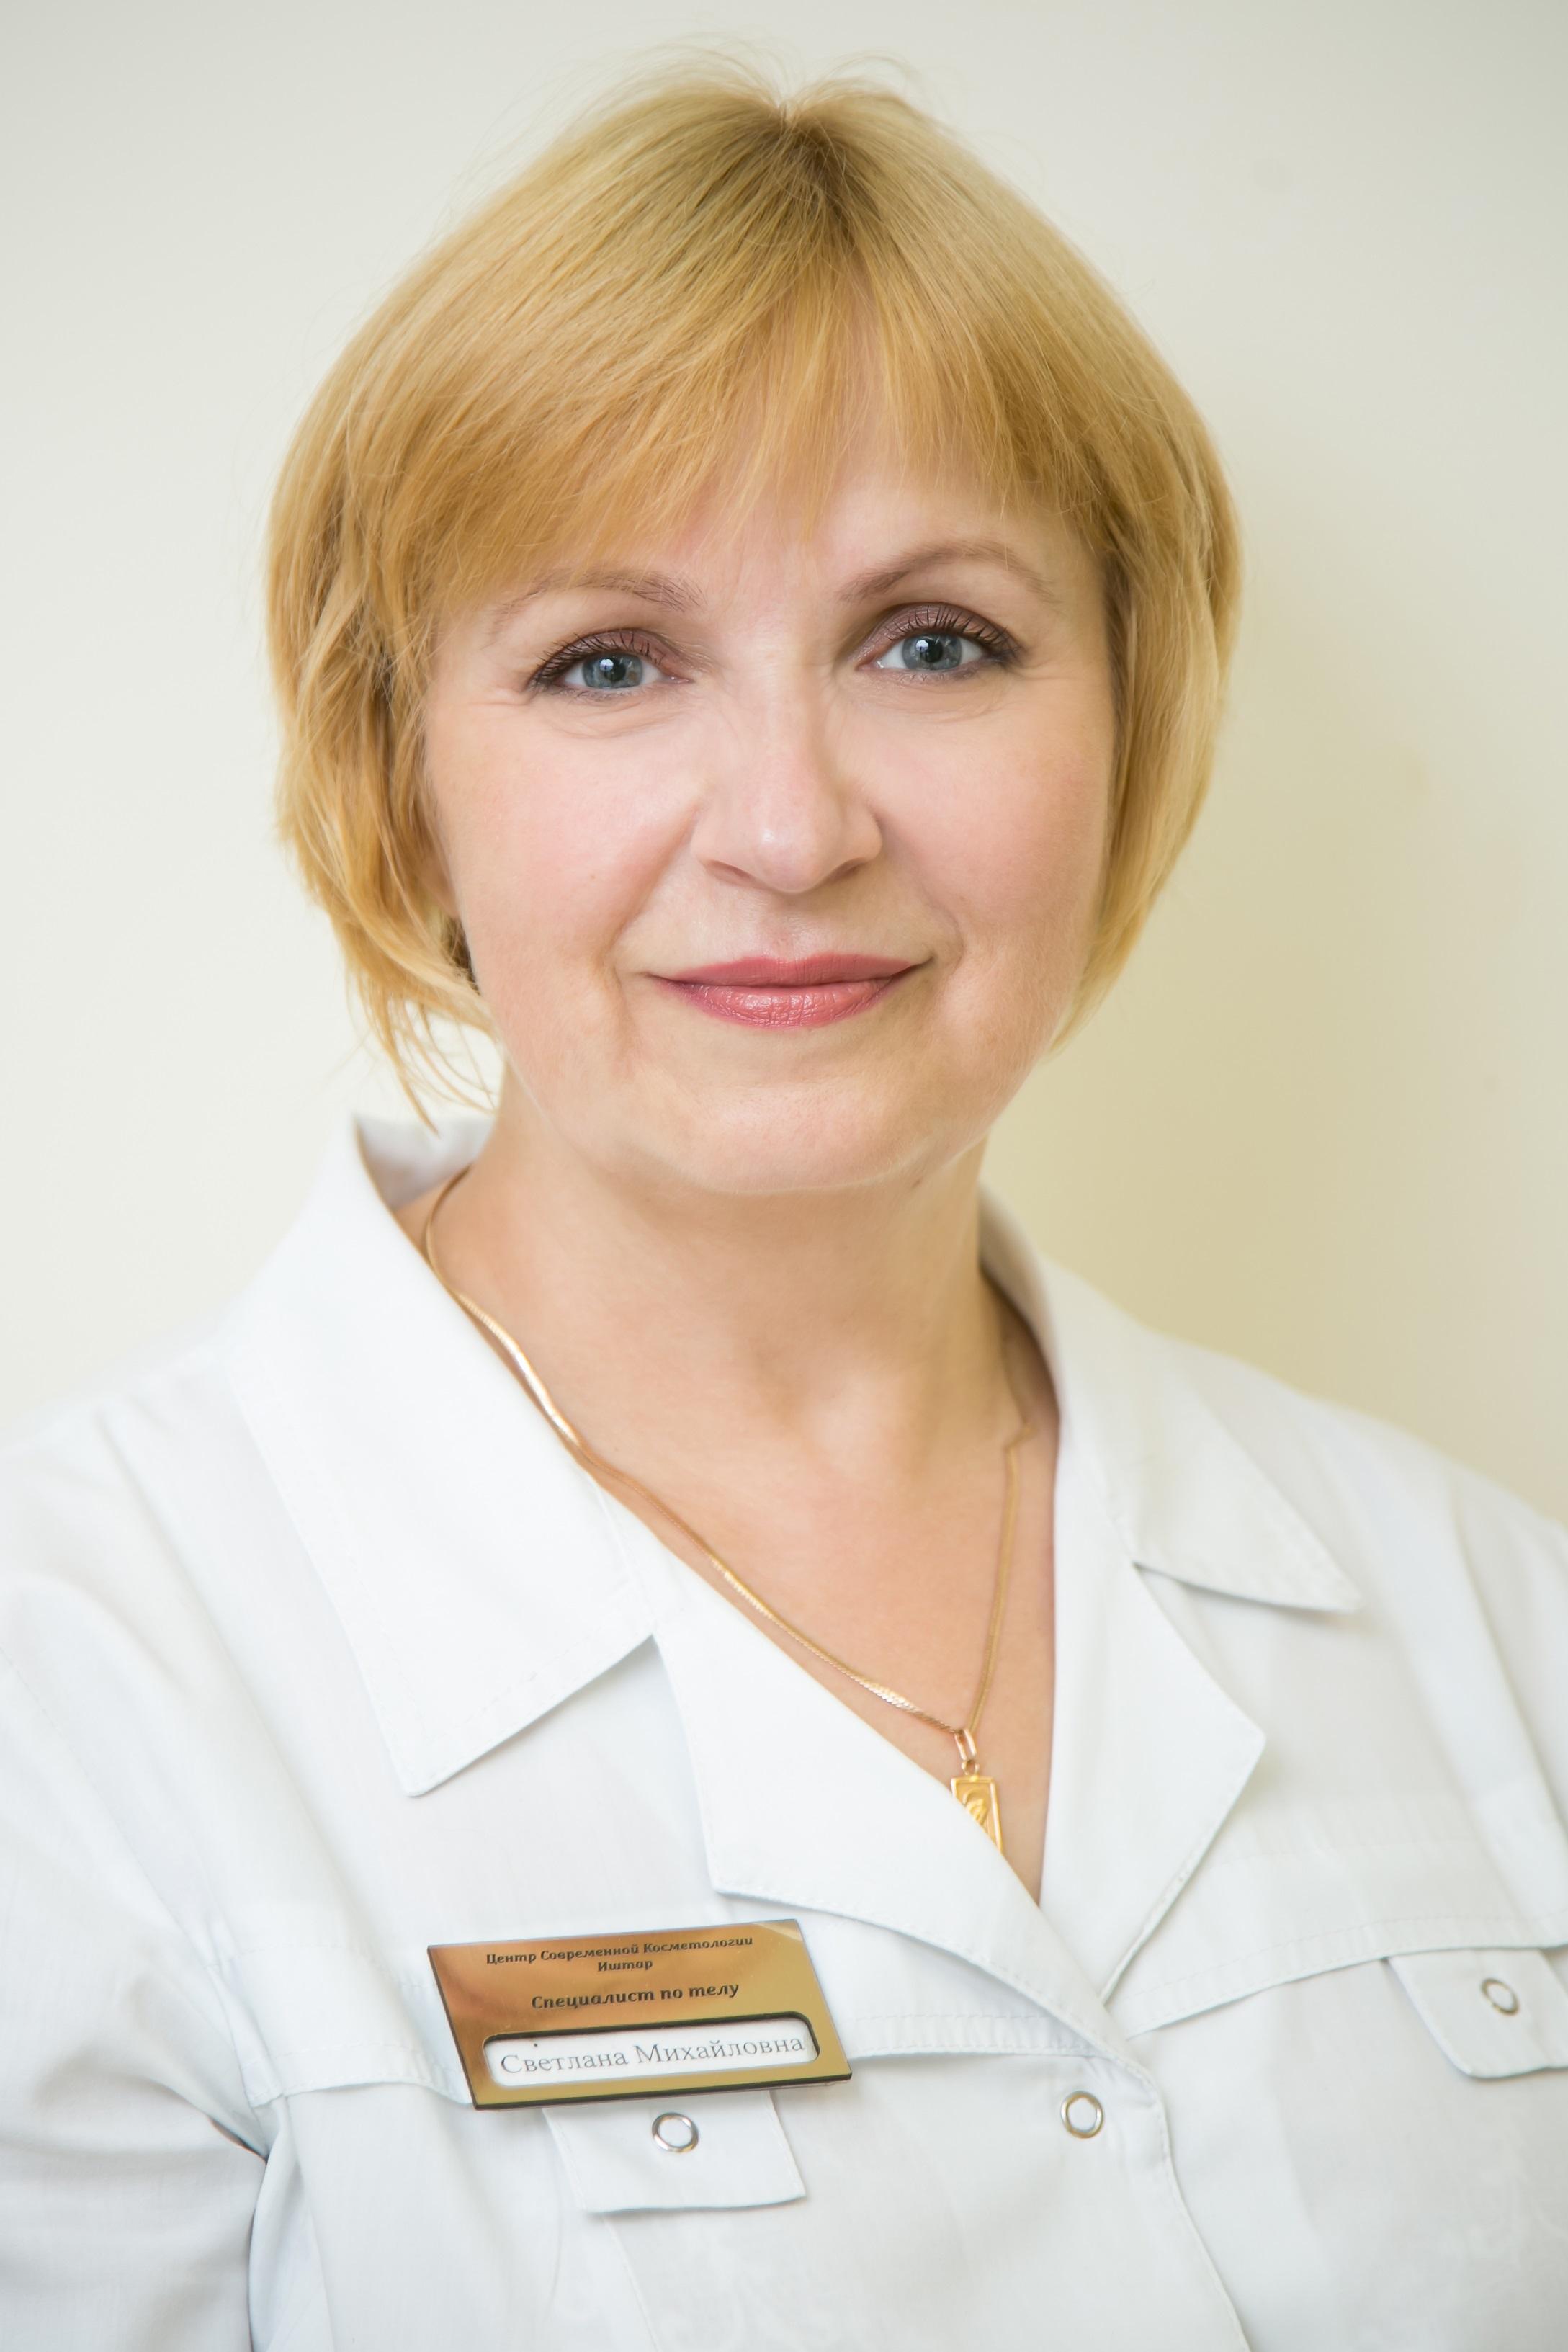 Косметик-эстетист Дорошева Светлана Михайловна